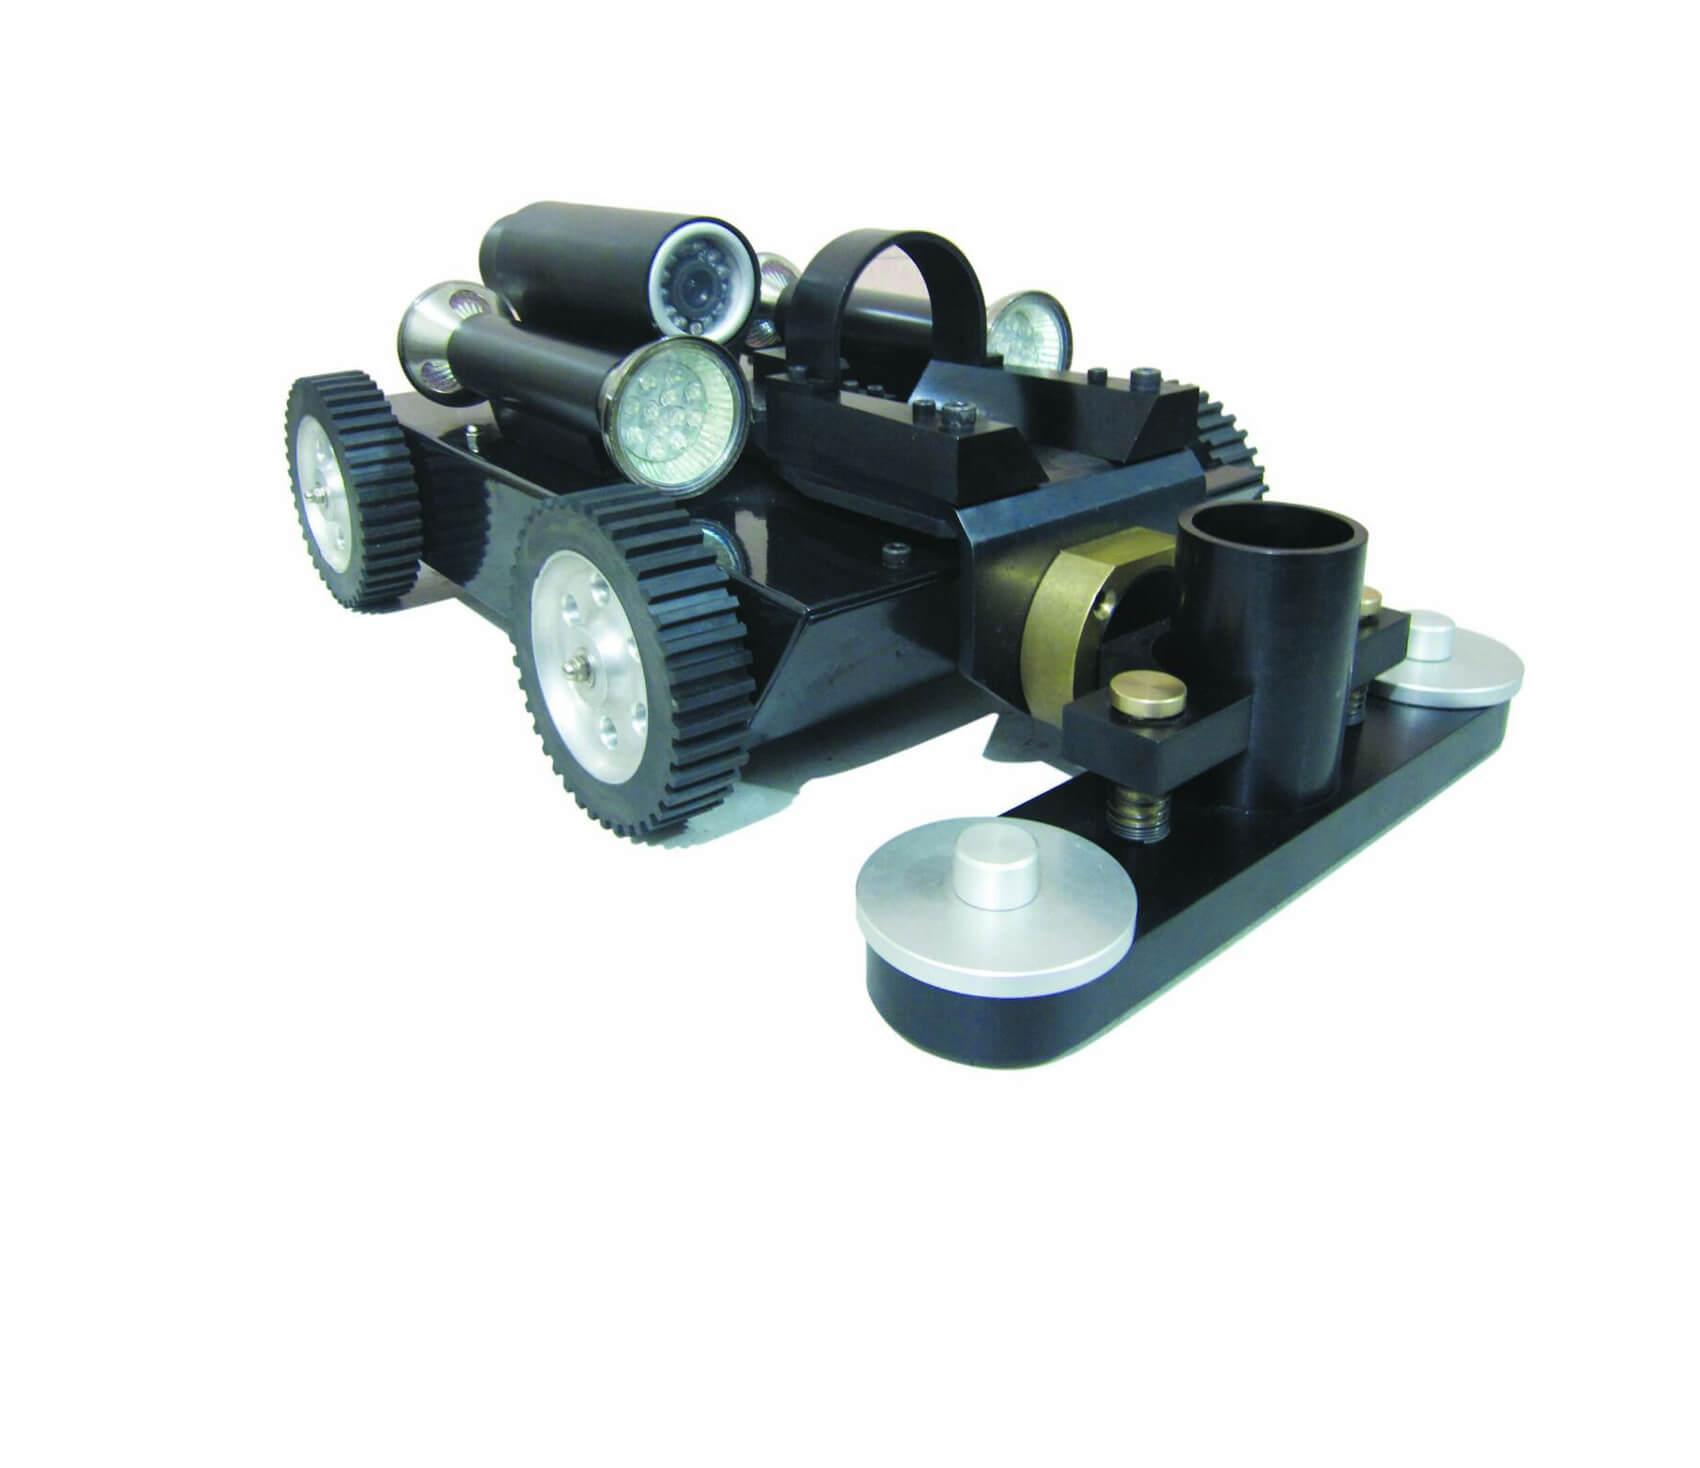 modular-type-dust-absorption-robot-image